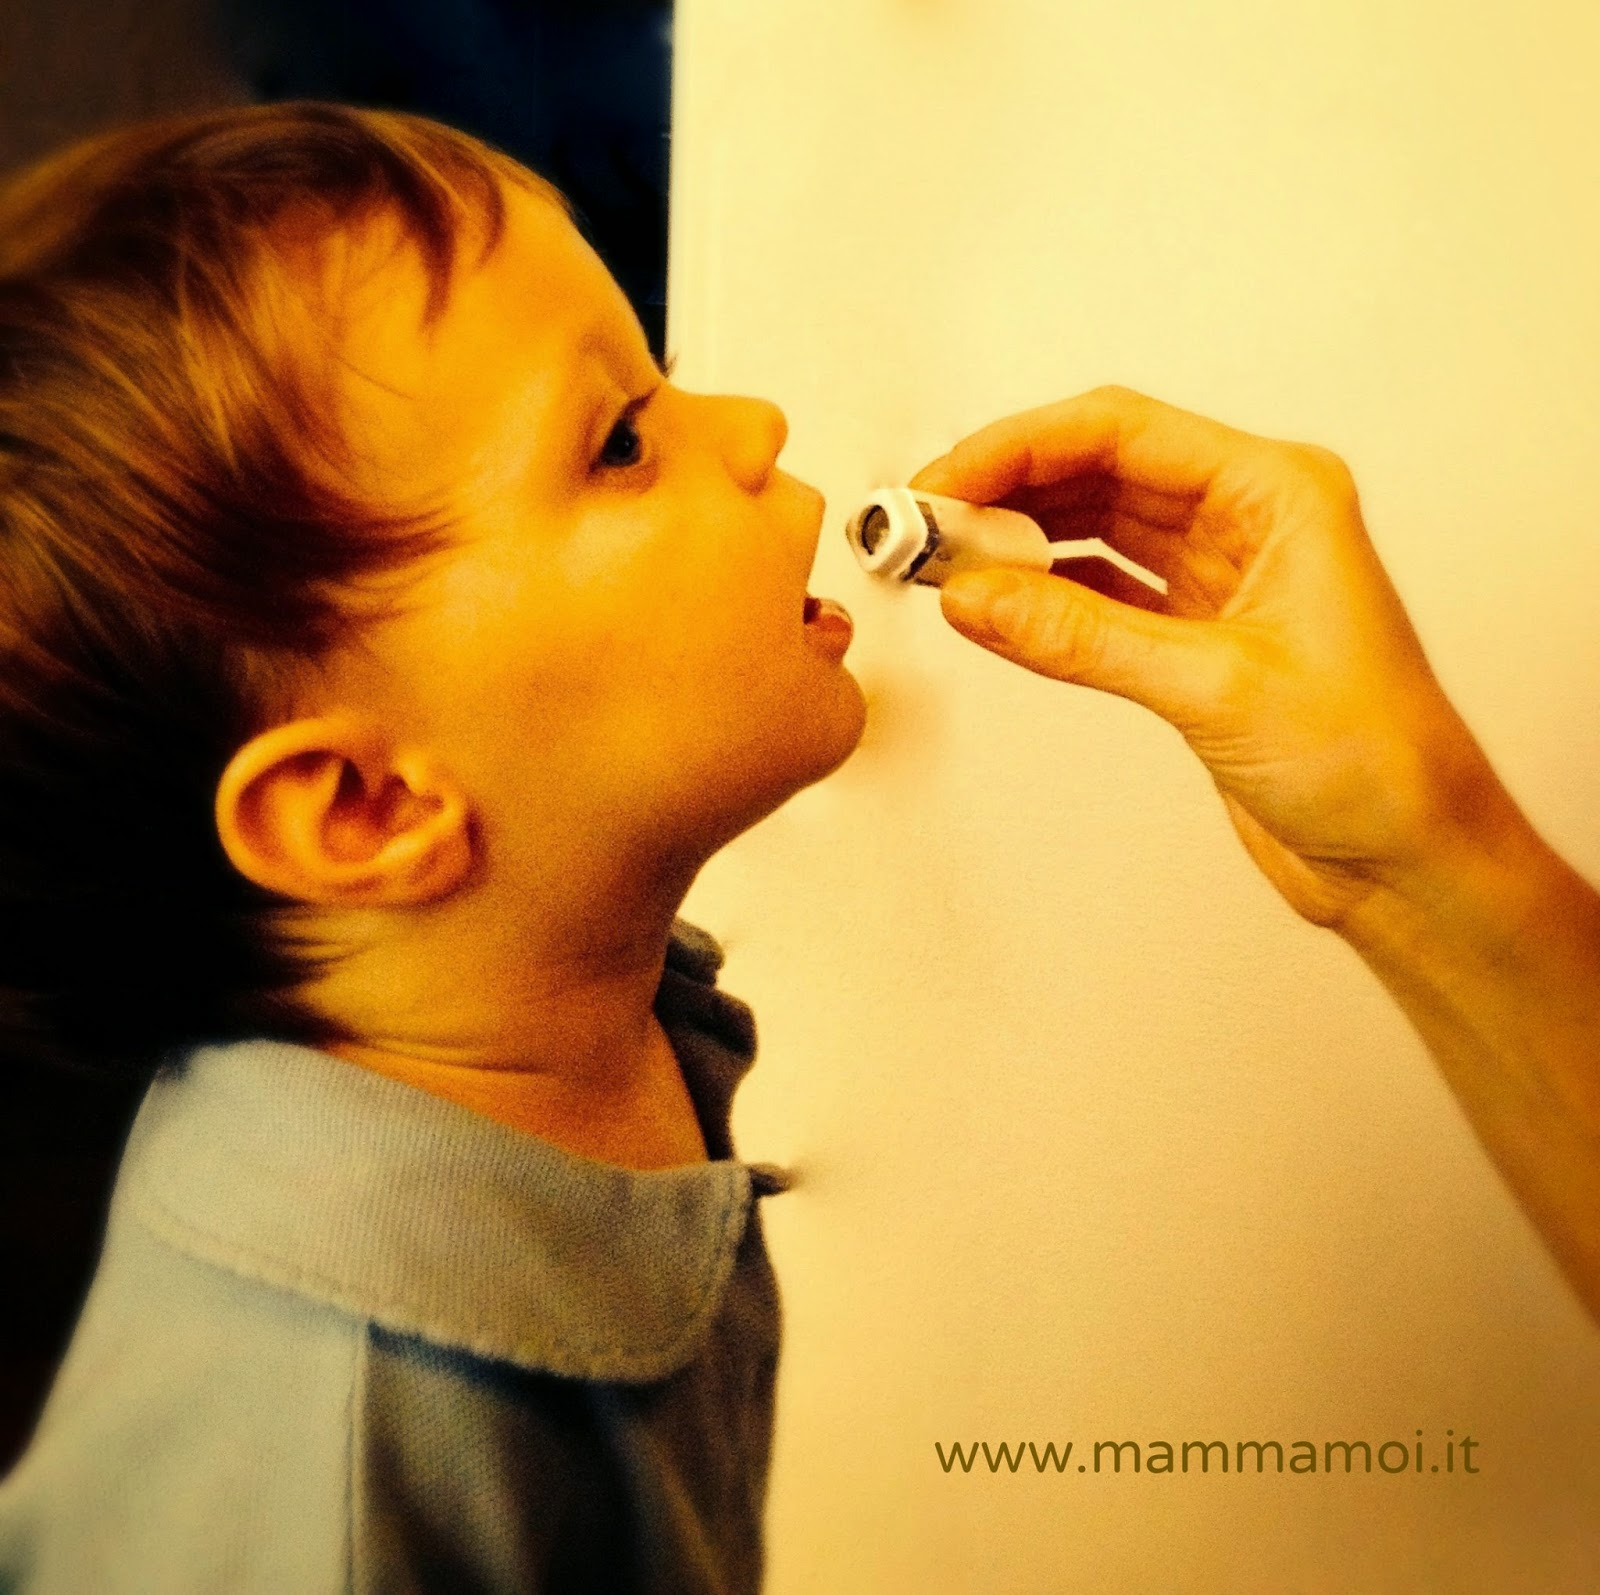 Bambina che assume i rimedi omeopatici